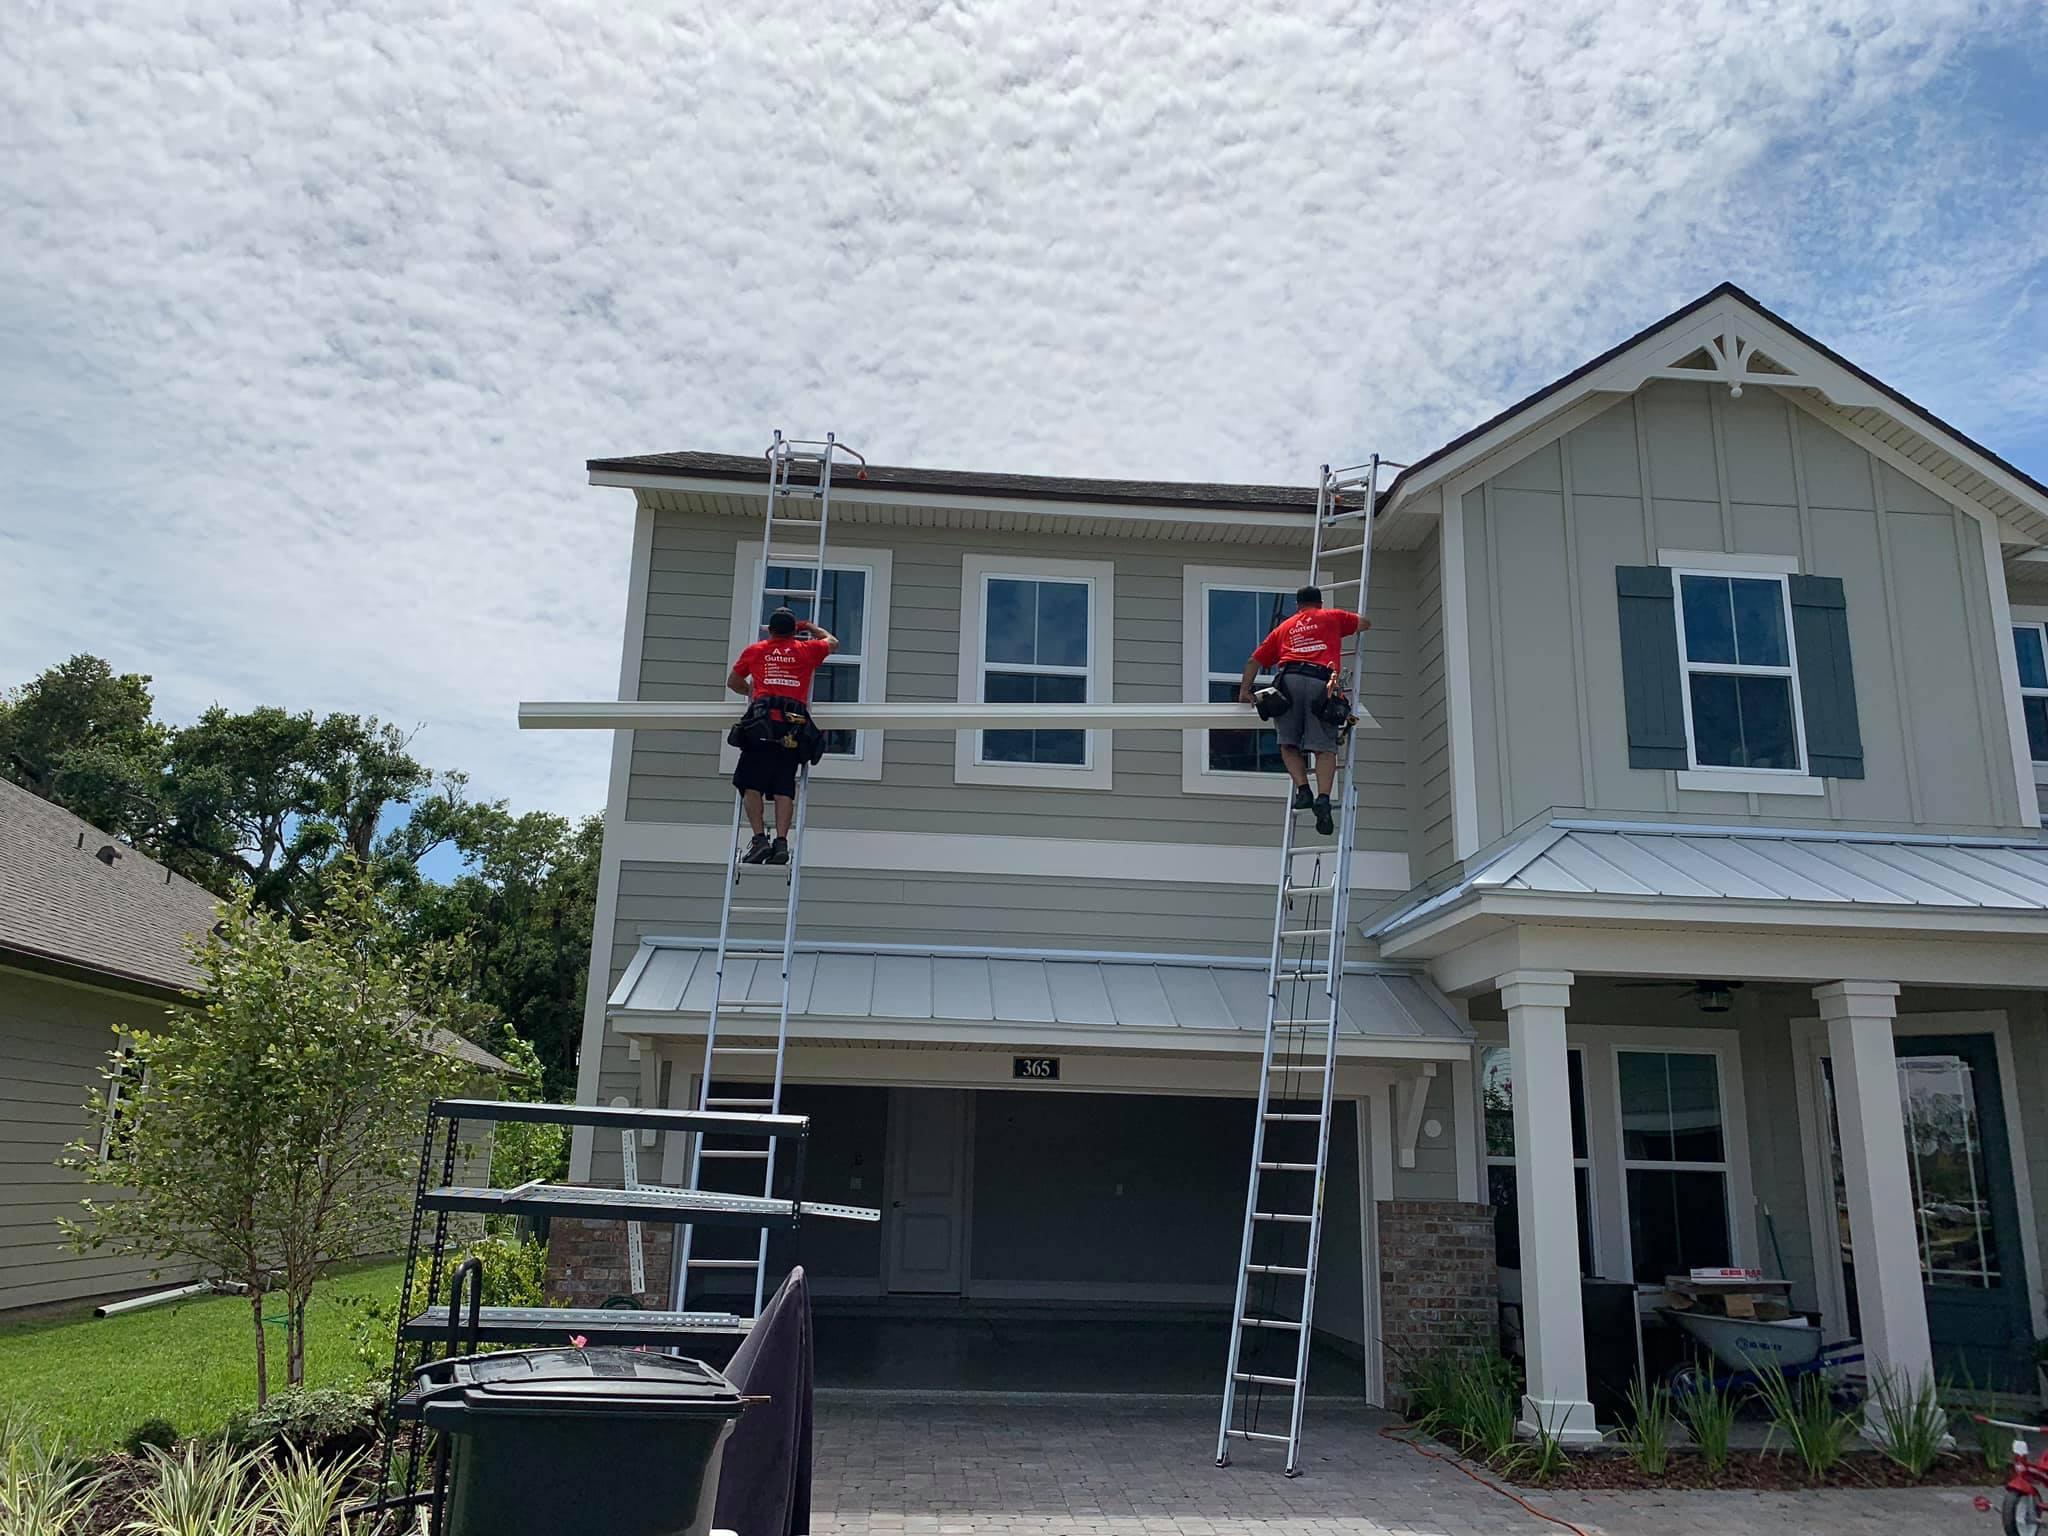 Gutter Contractor In Orange Park Fl 904 924 5650 A